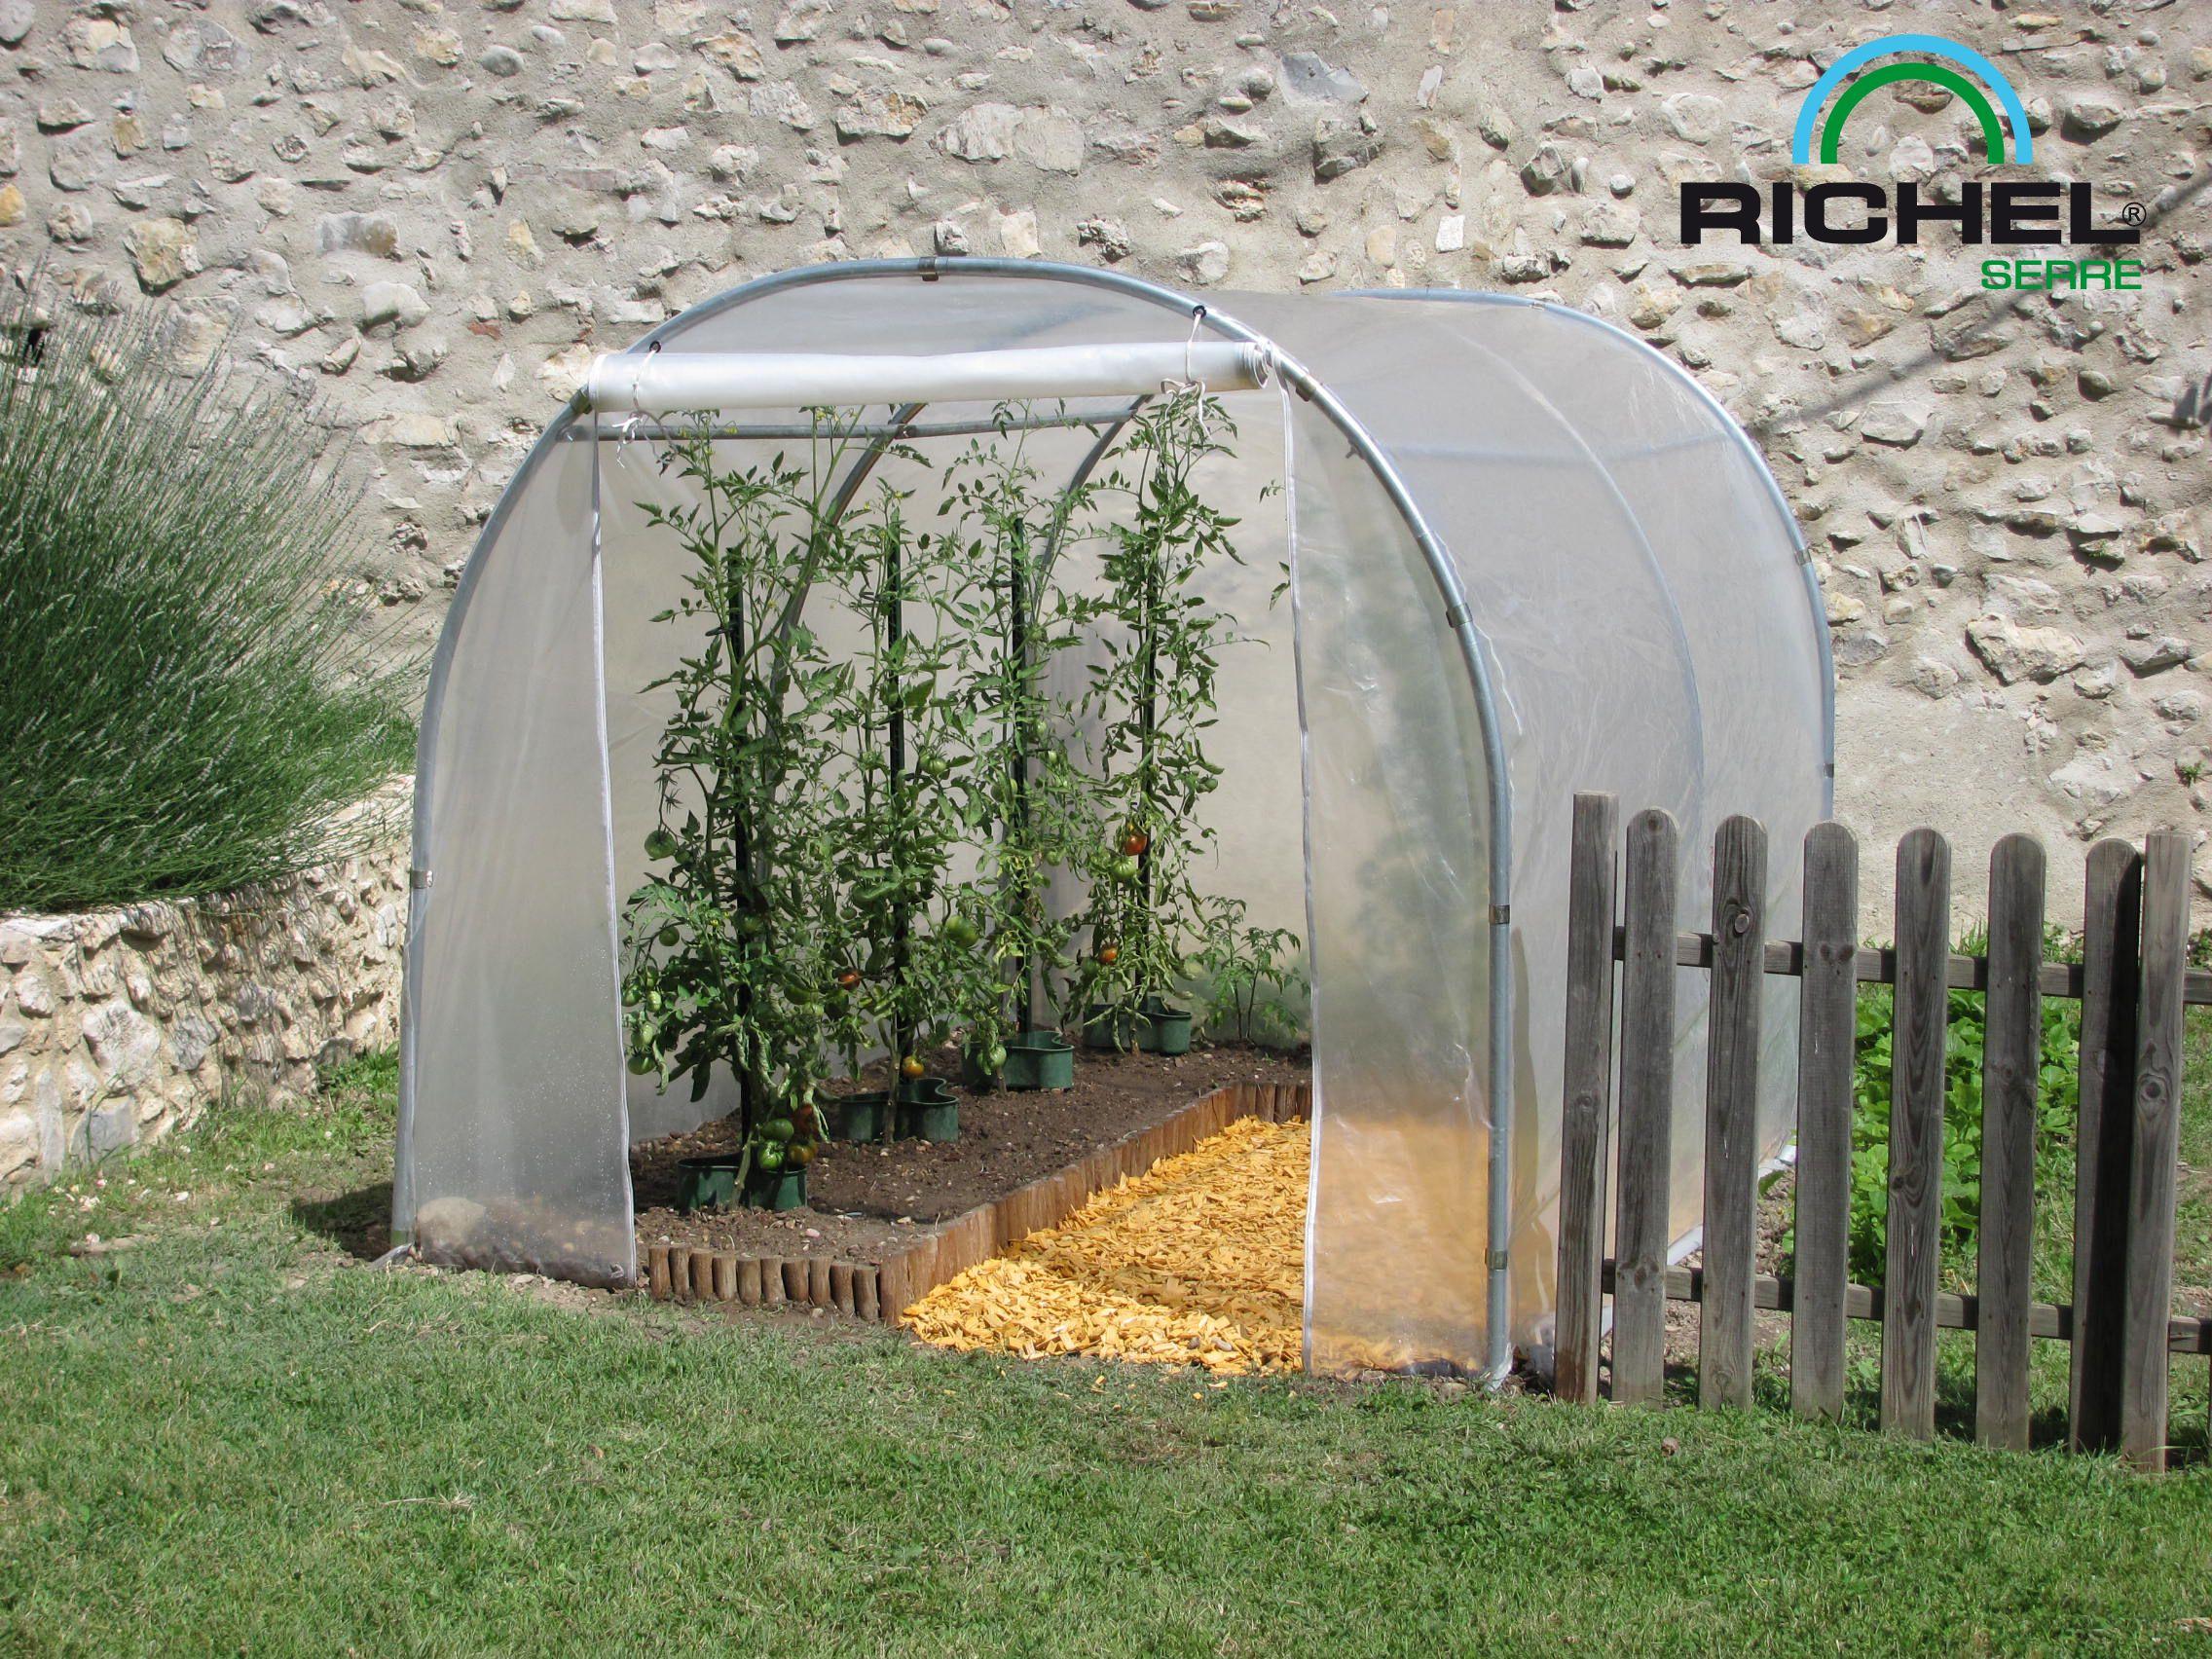 serre de jardin richel 6m2 lekingstore serres pinterest serre de jardin serre et jardins. Black Bedroom Furniture Sets. Home Design Ideas